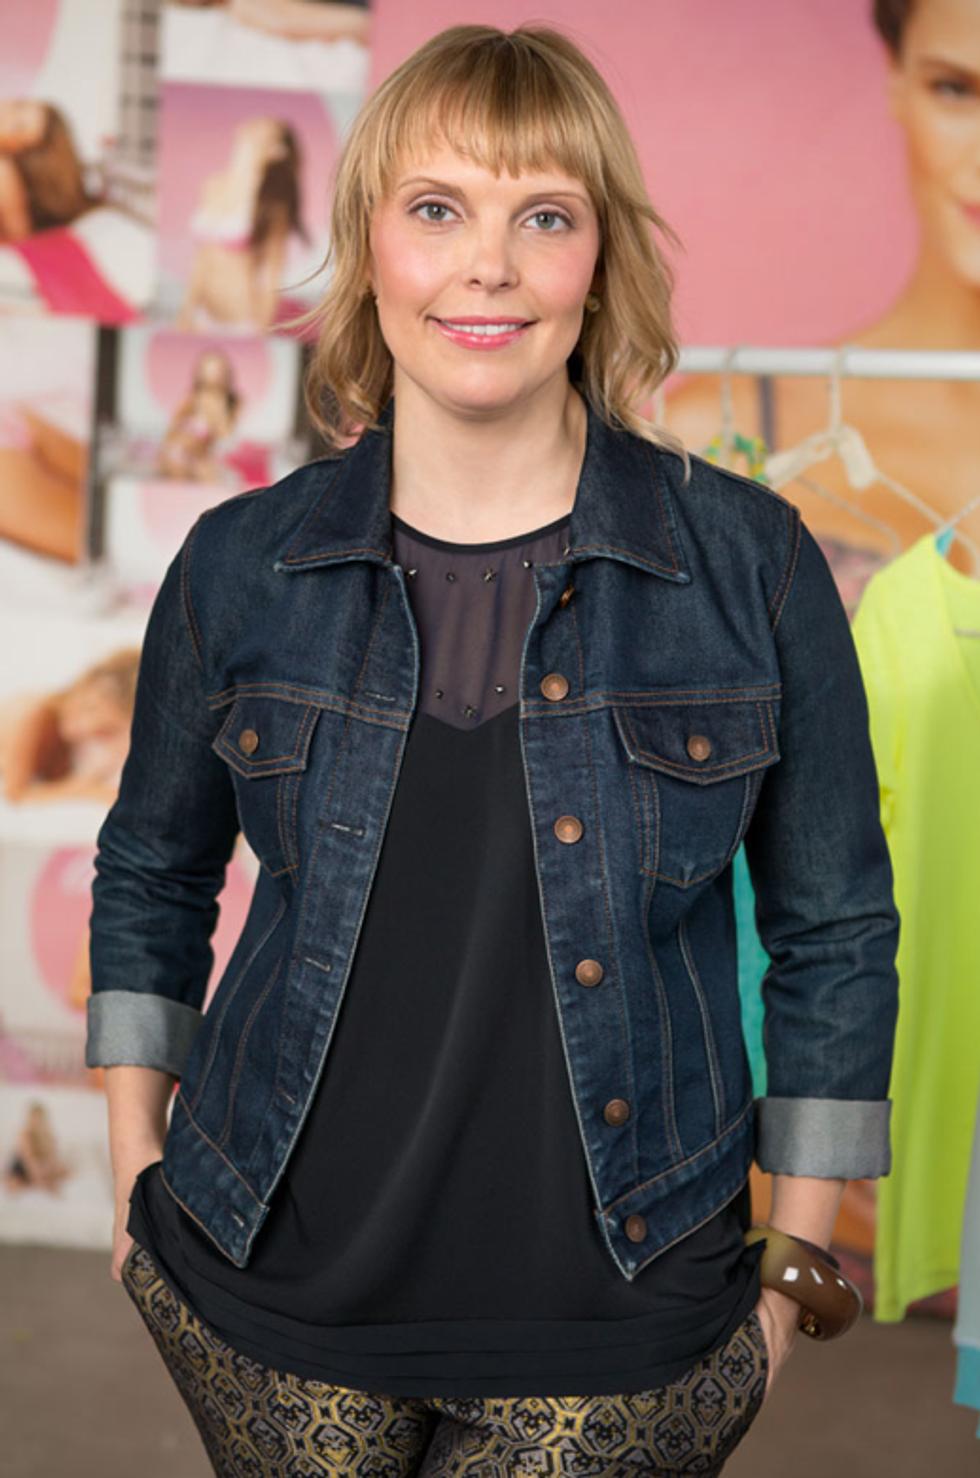 Girls Costume Designer Jenn Rogien On Plastic Dresses, Beet Stains and What We Can Expect In Season 3